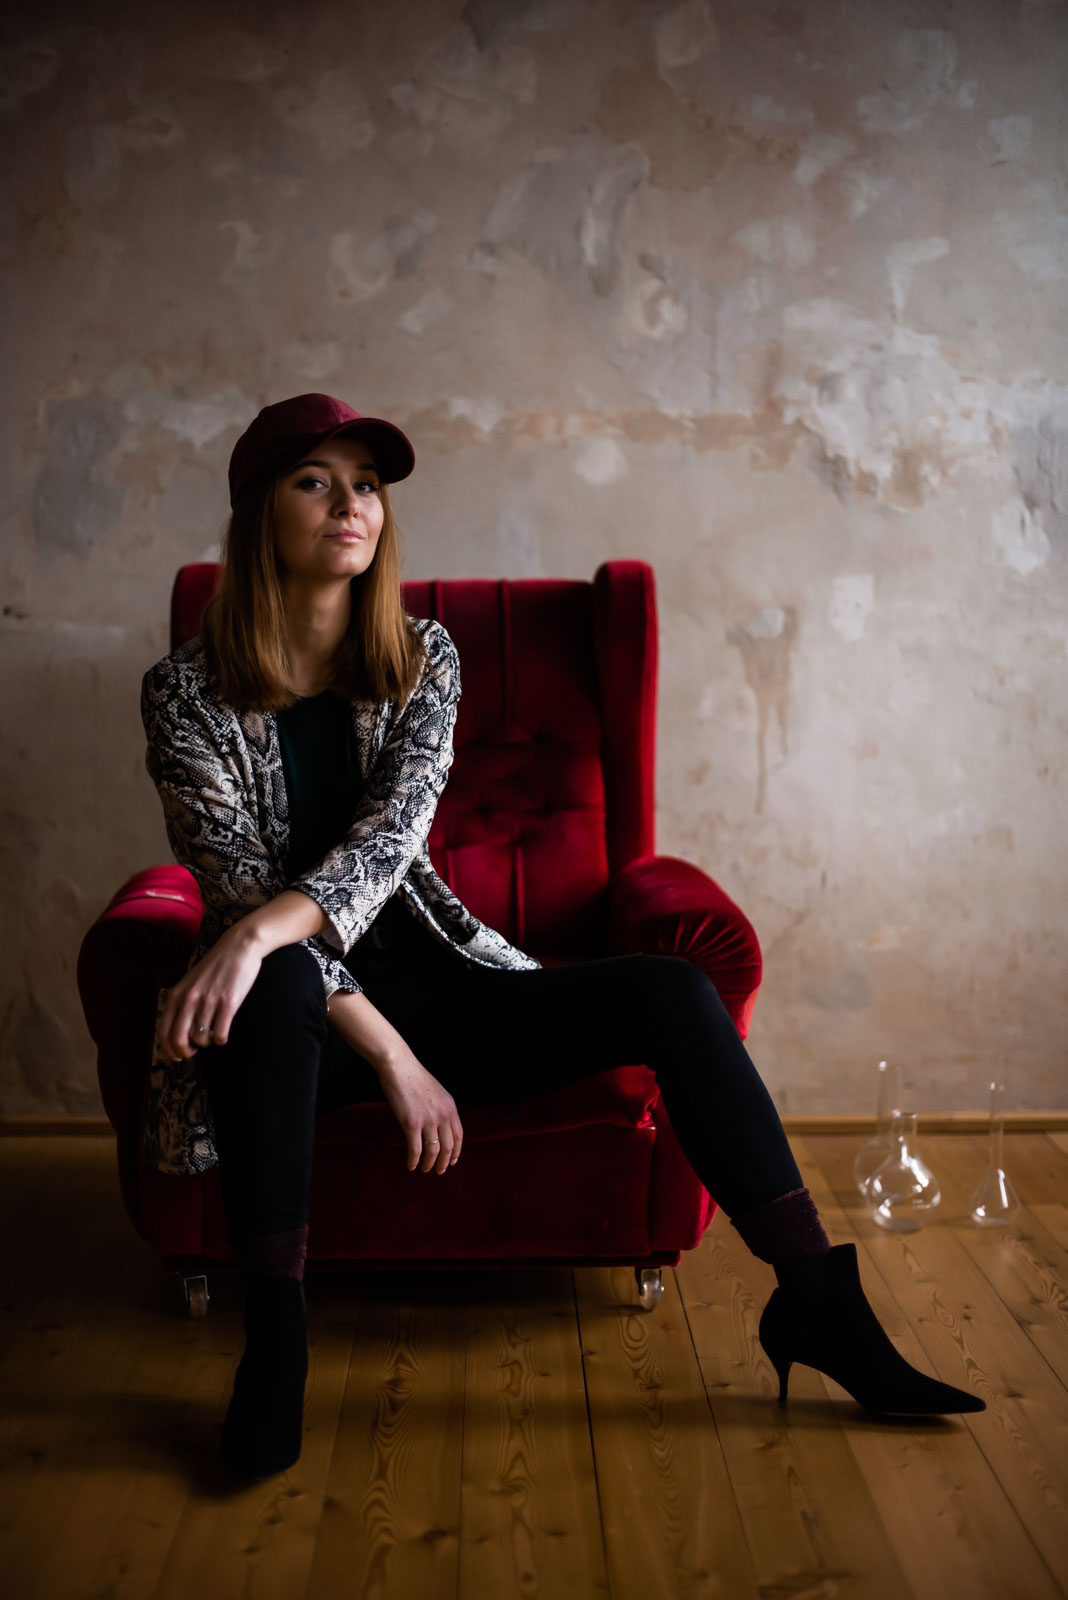 fashion blogger wearing snake print blazer sitting at red armchair